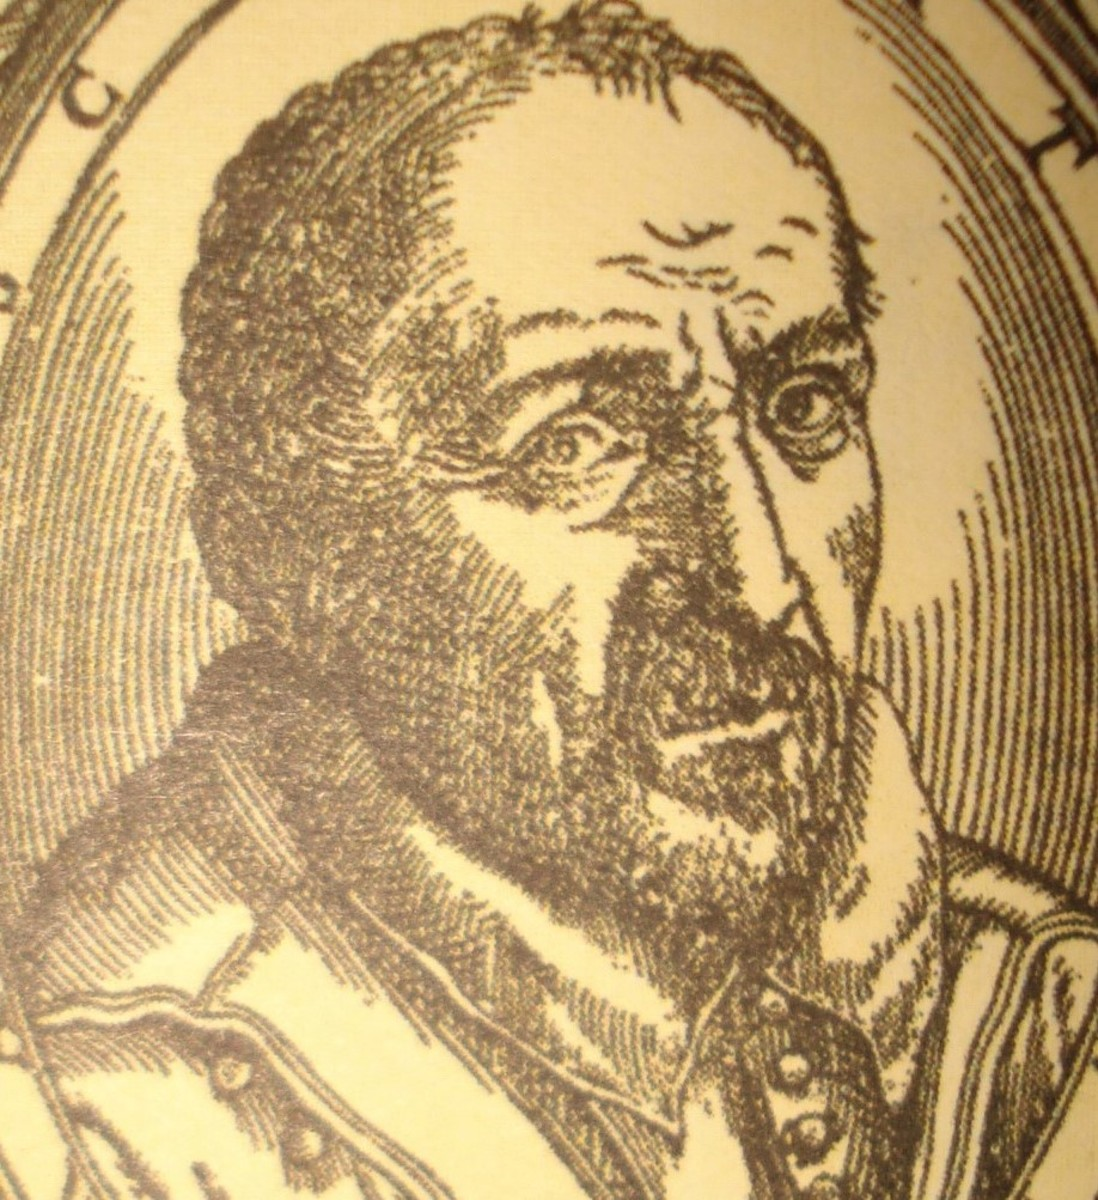 Francesco Patrizi, Portrait (1587)